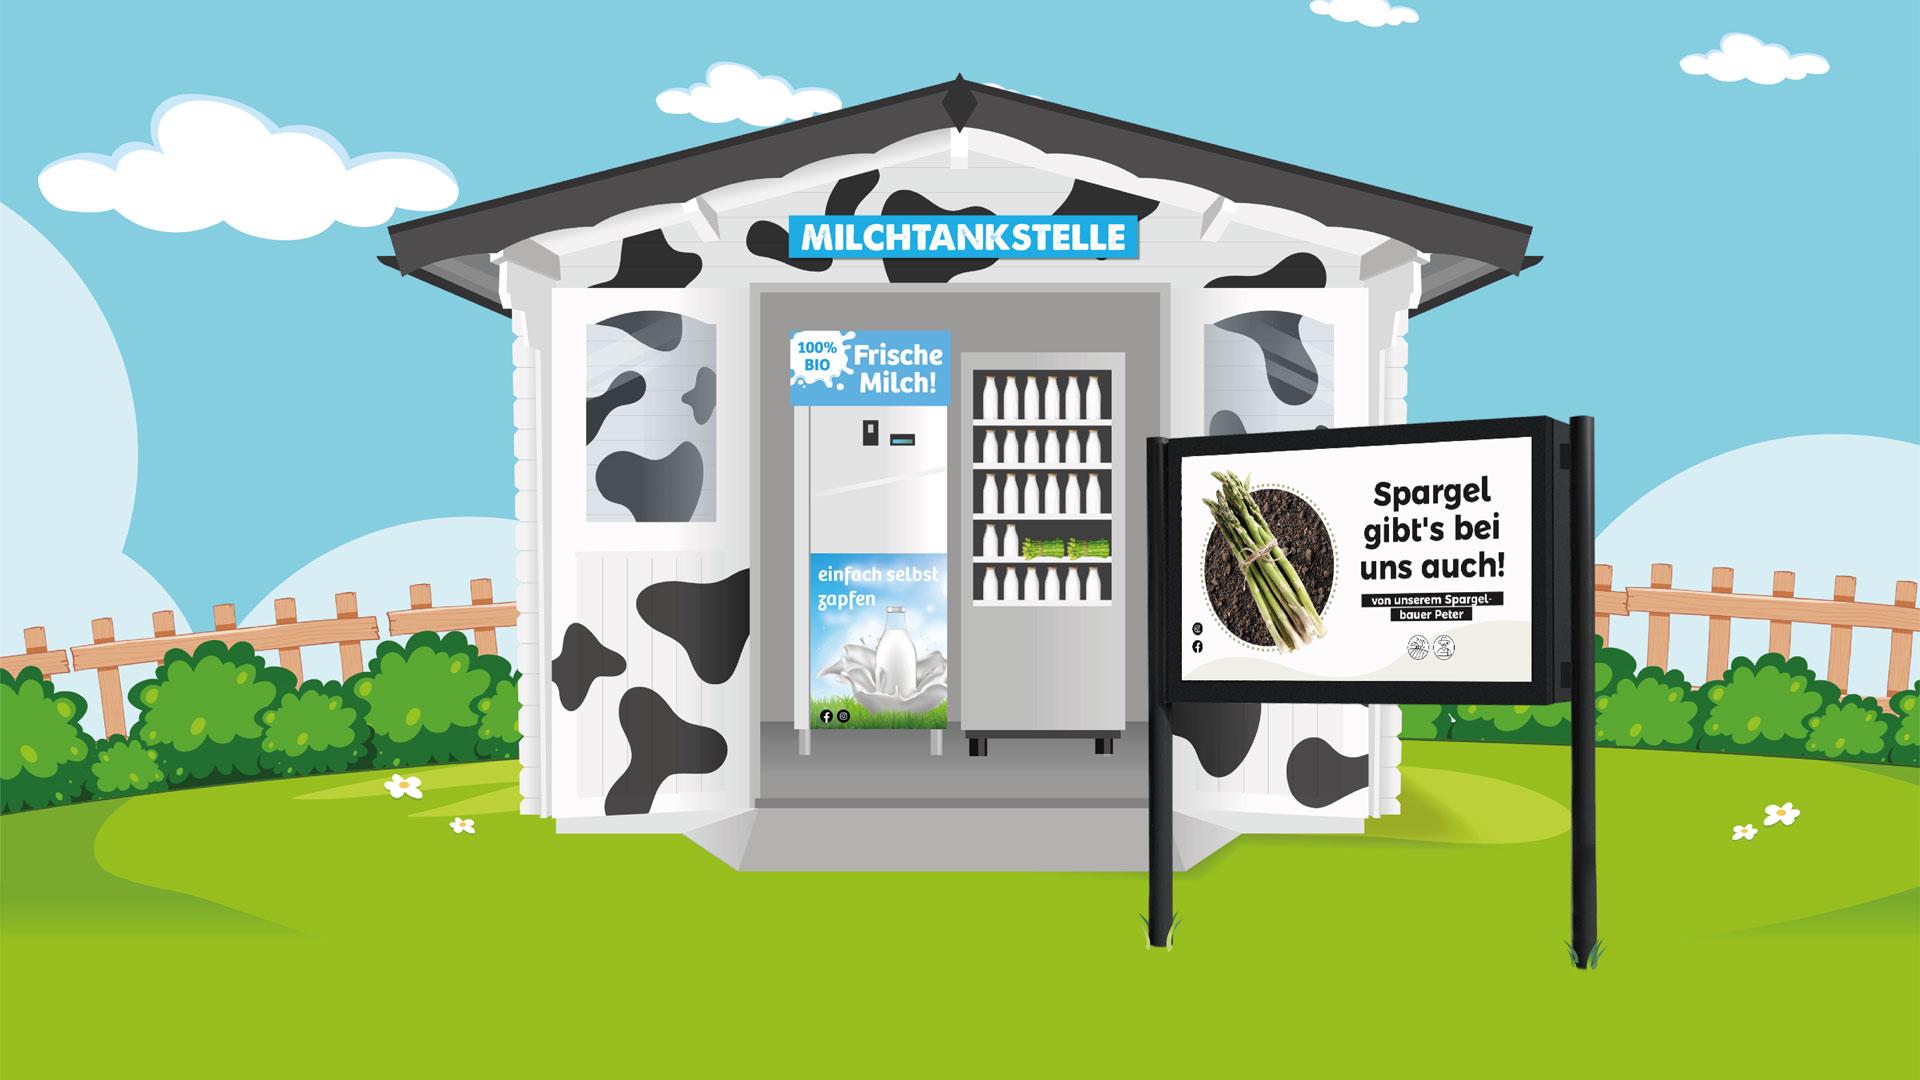 Milchtankstelle Lebensmittelautomat mit Digital Signage